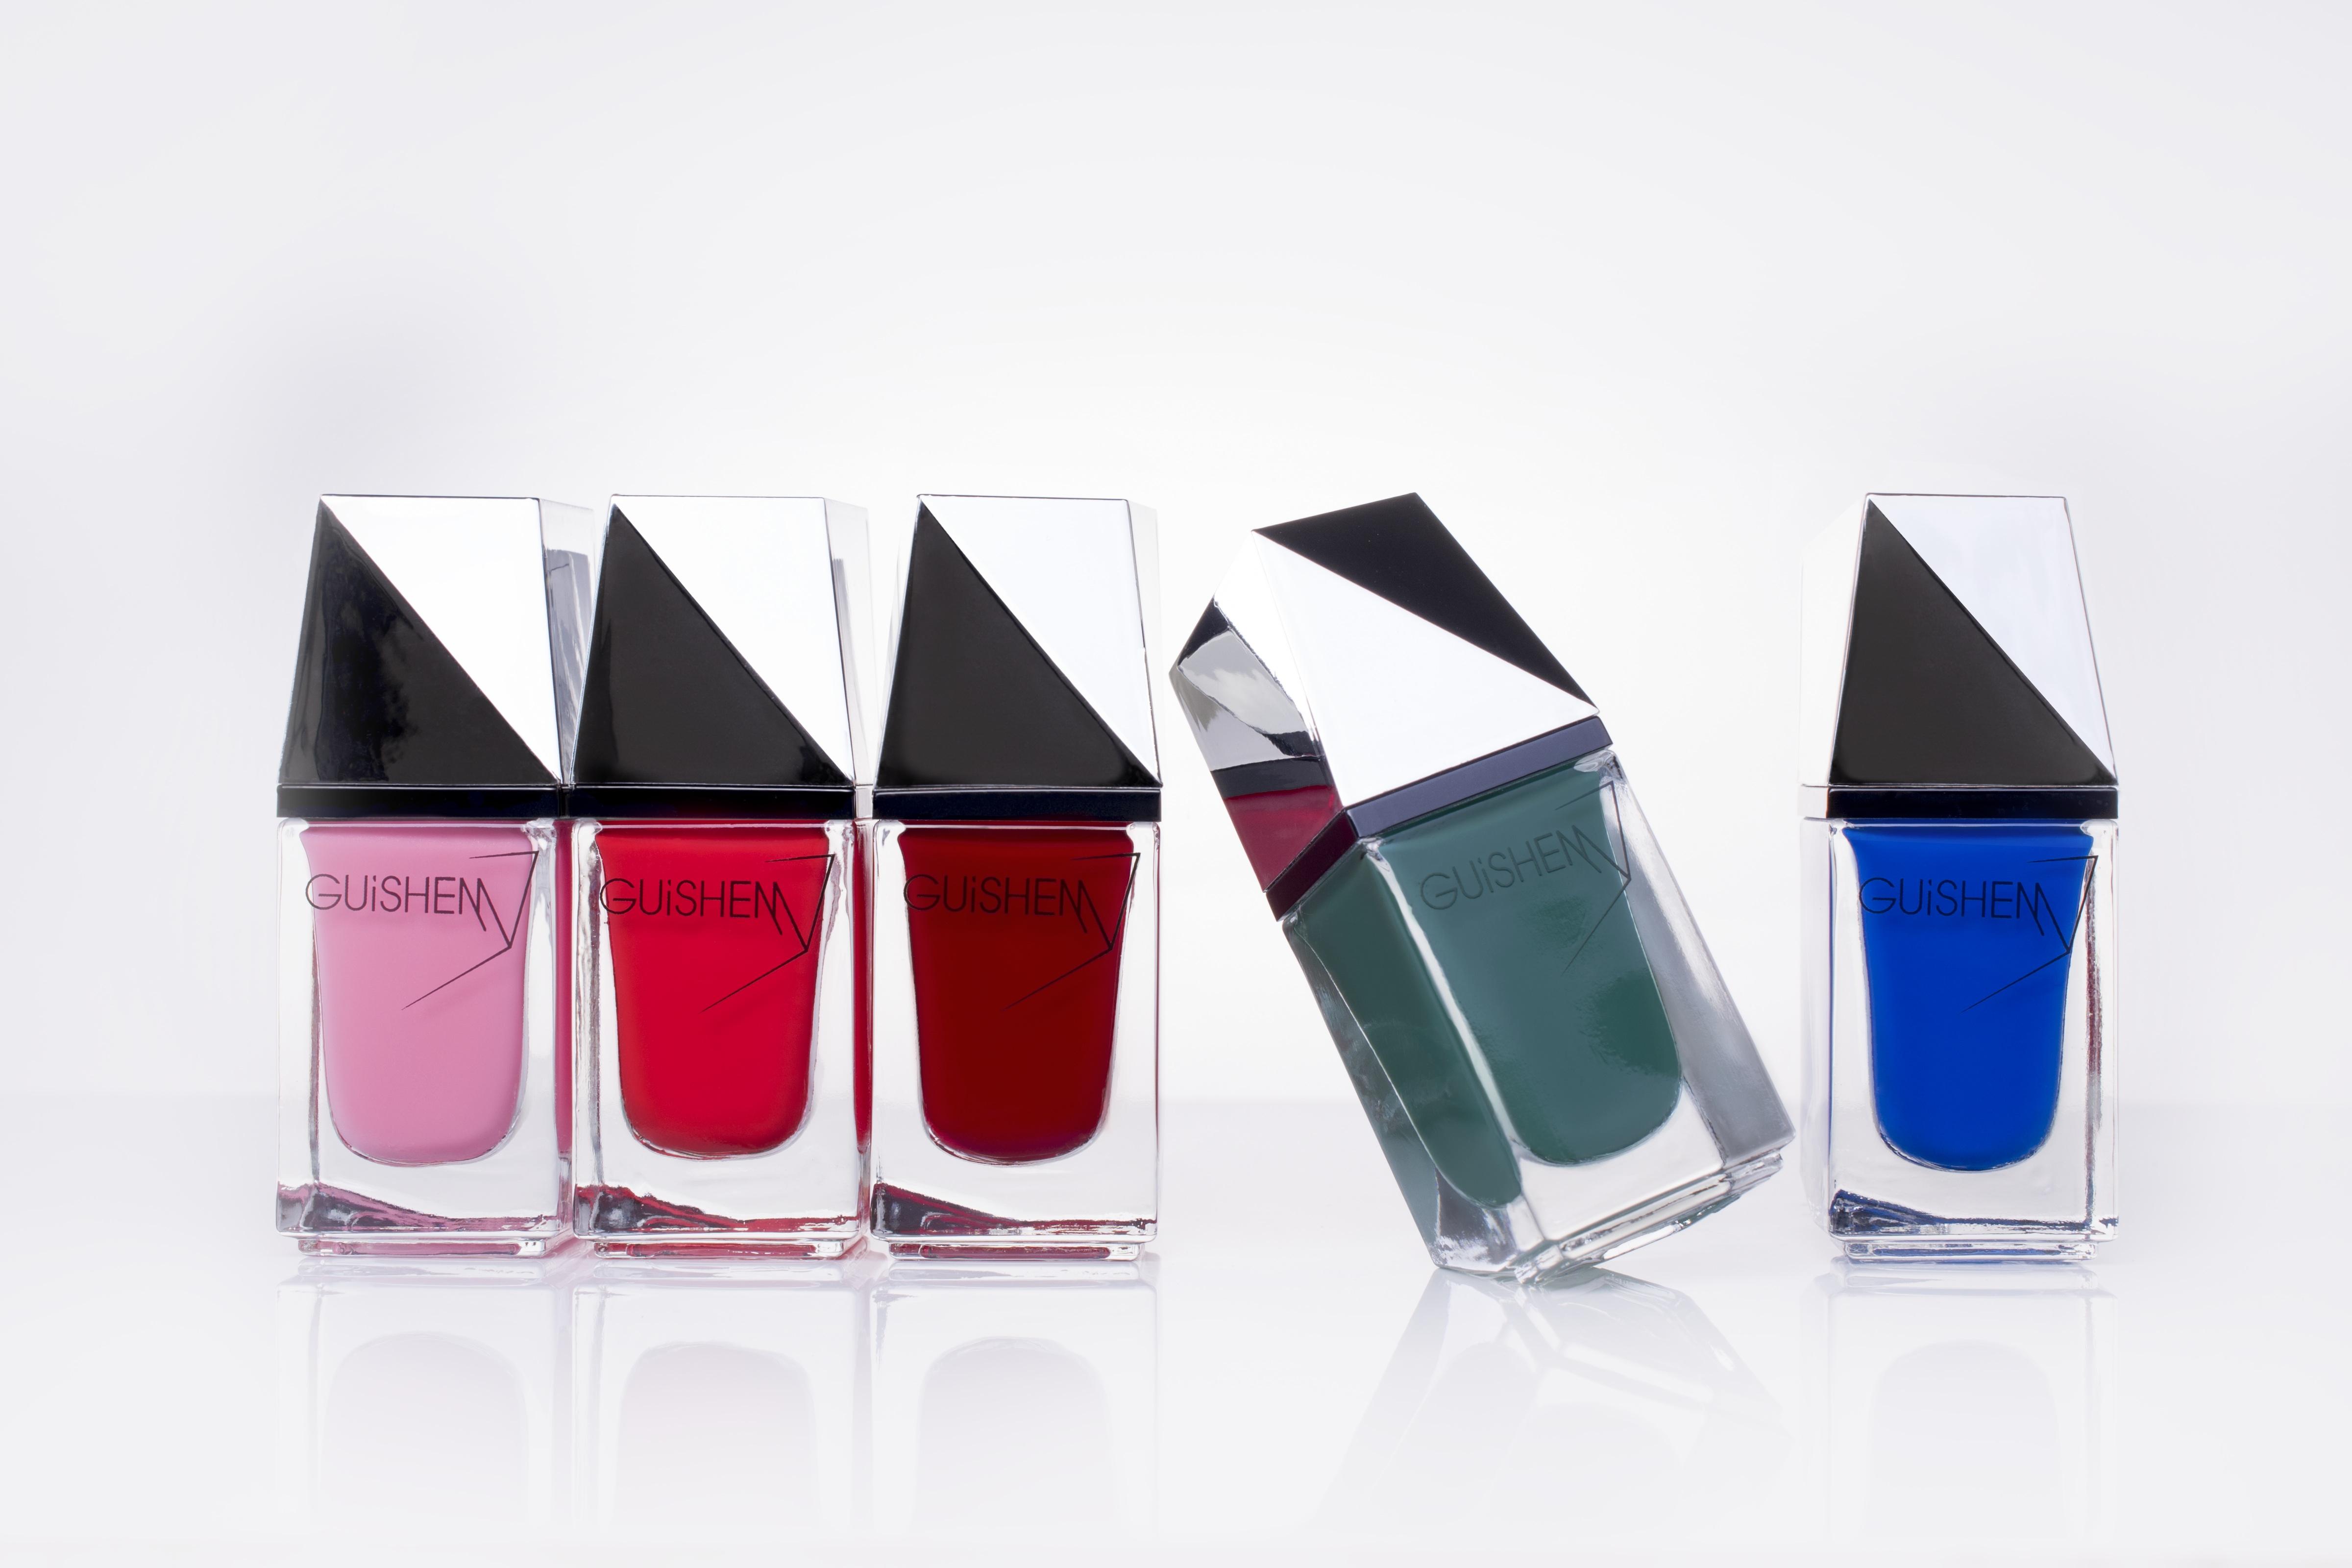 GUiSHEM's debut nail collection